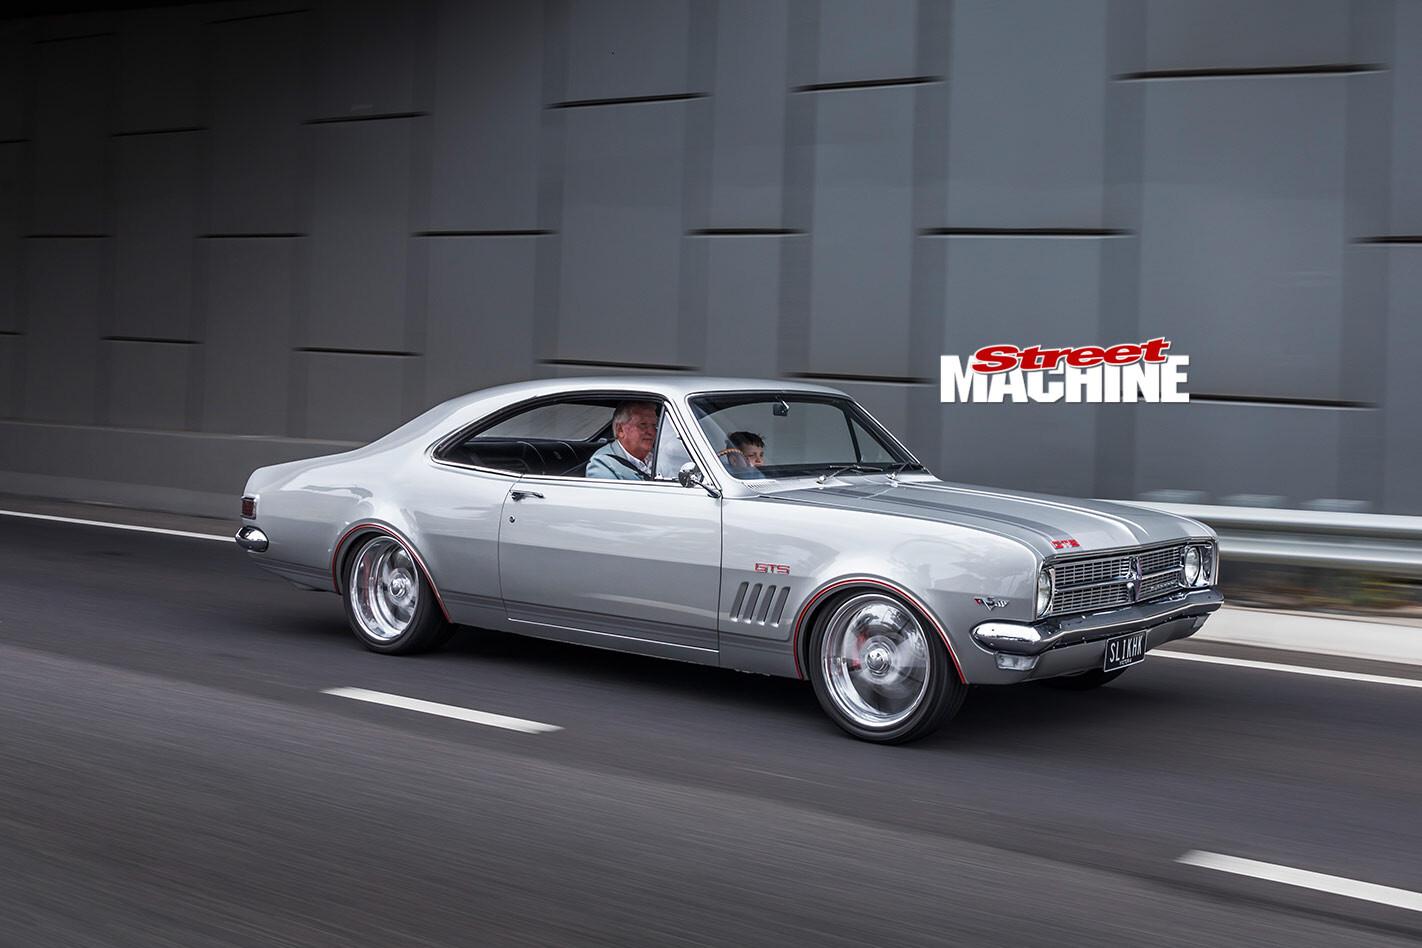 Holden HK Monaro onroad